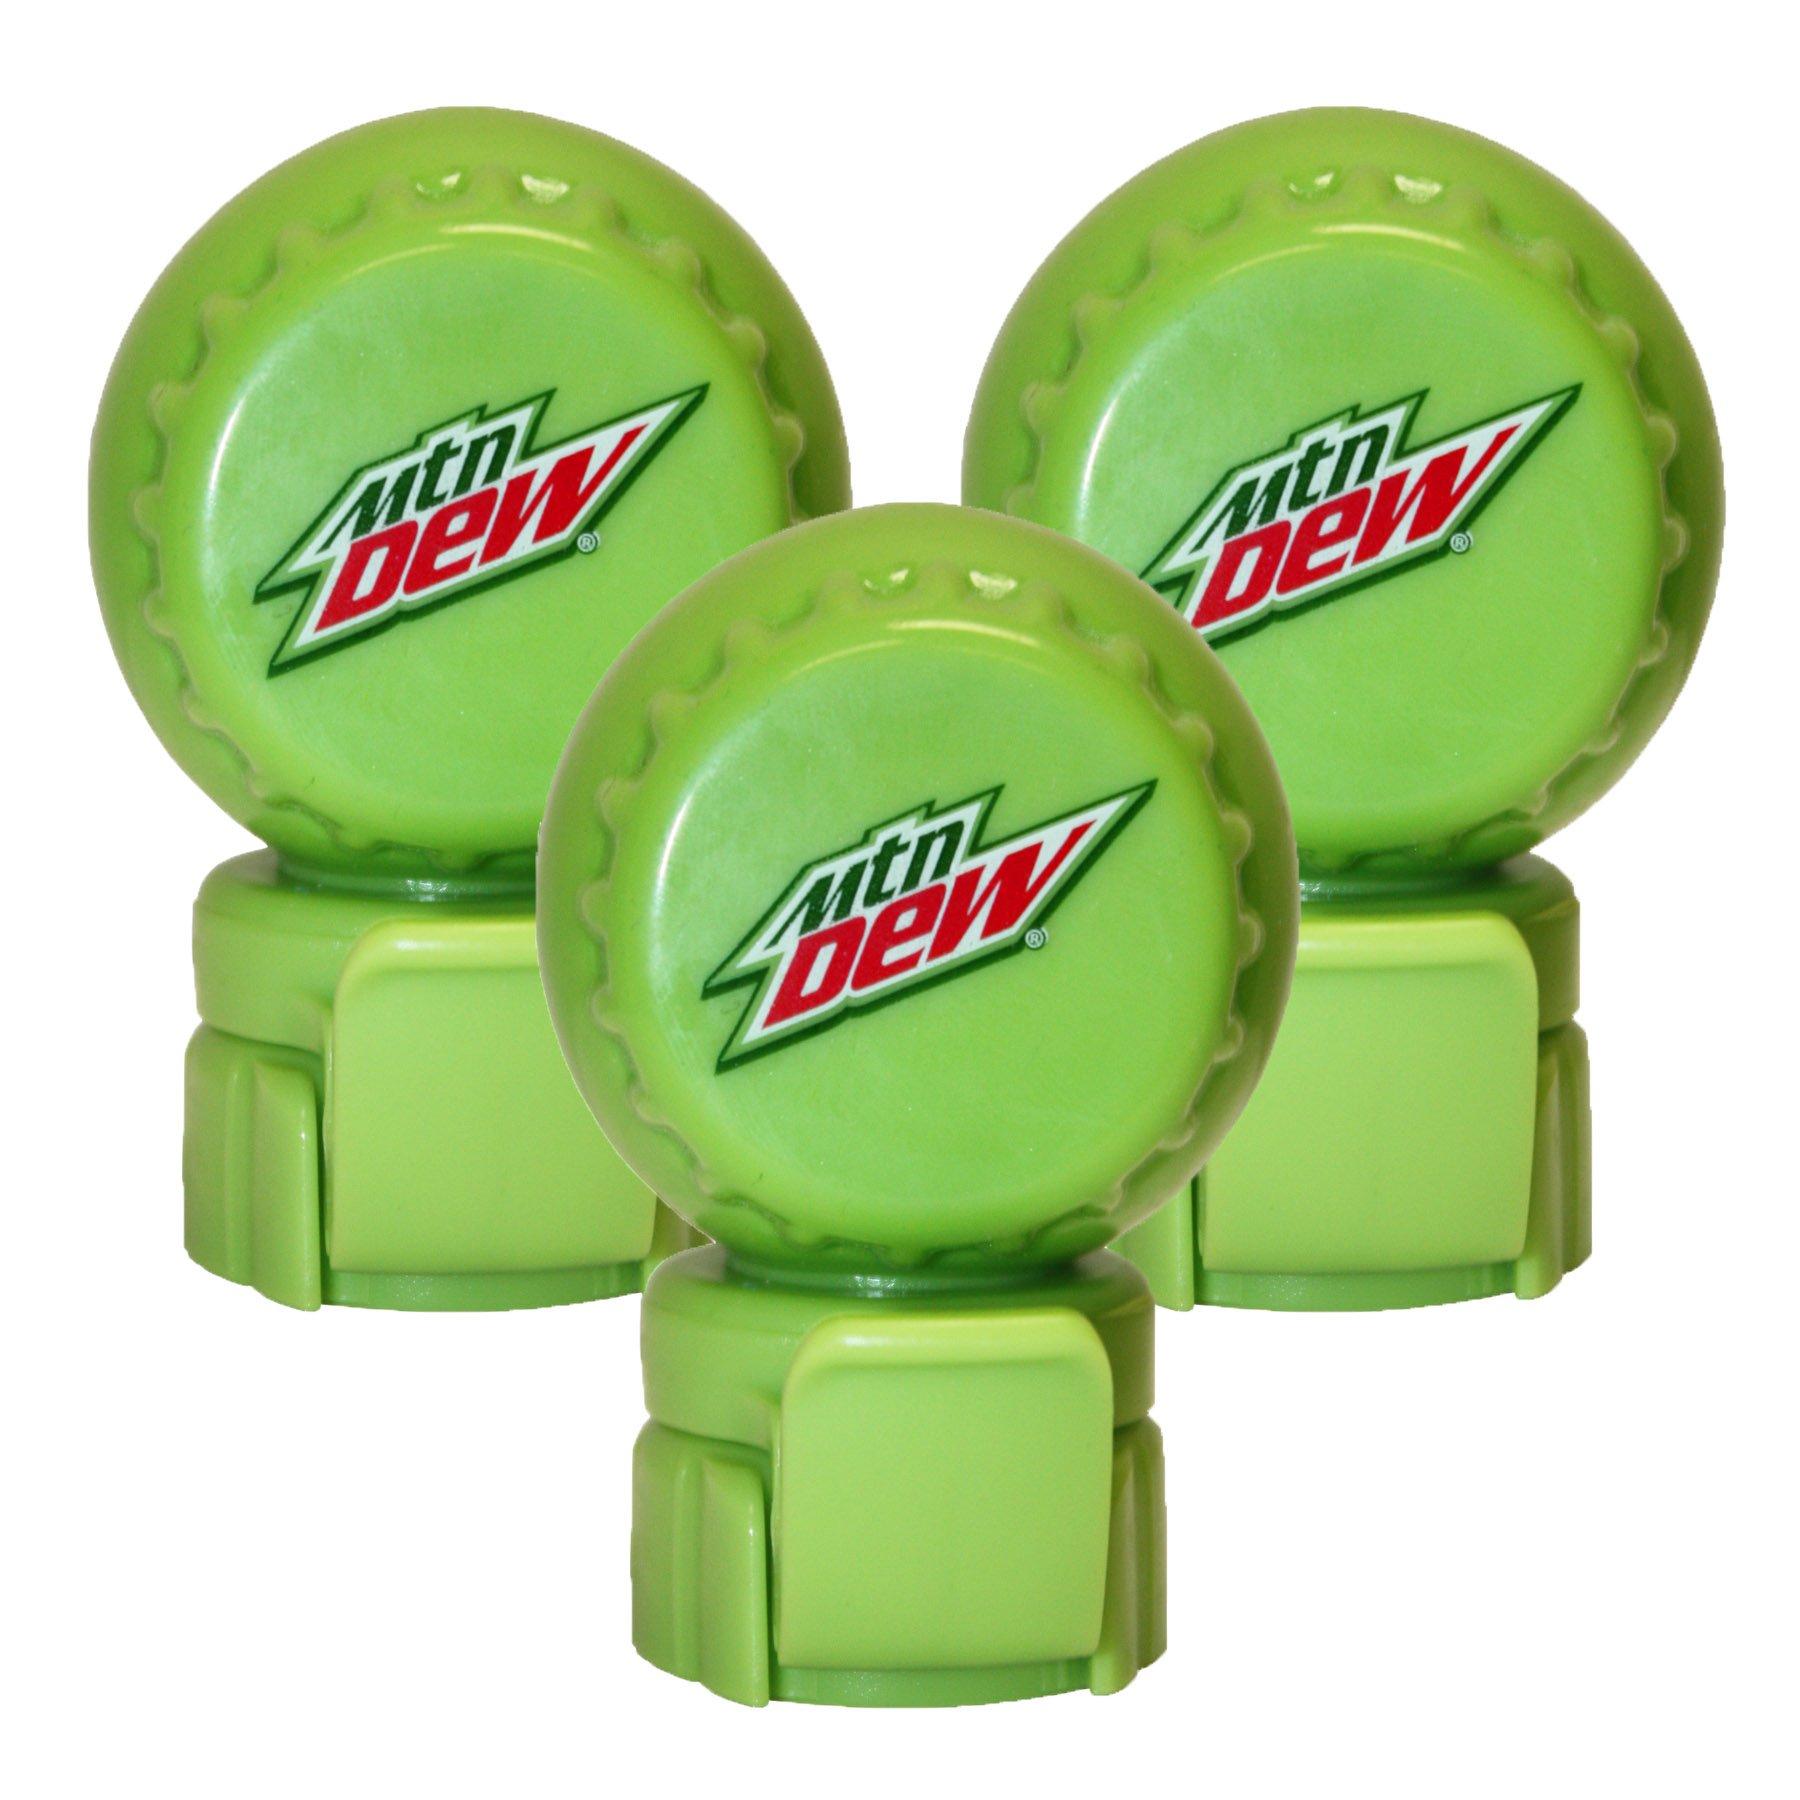 Jokari 3 Count Mtn Dew Modern Logo Fizz Keeper Soda Bottle Pump and Pour Caps, Green